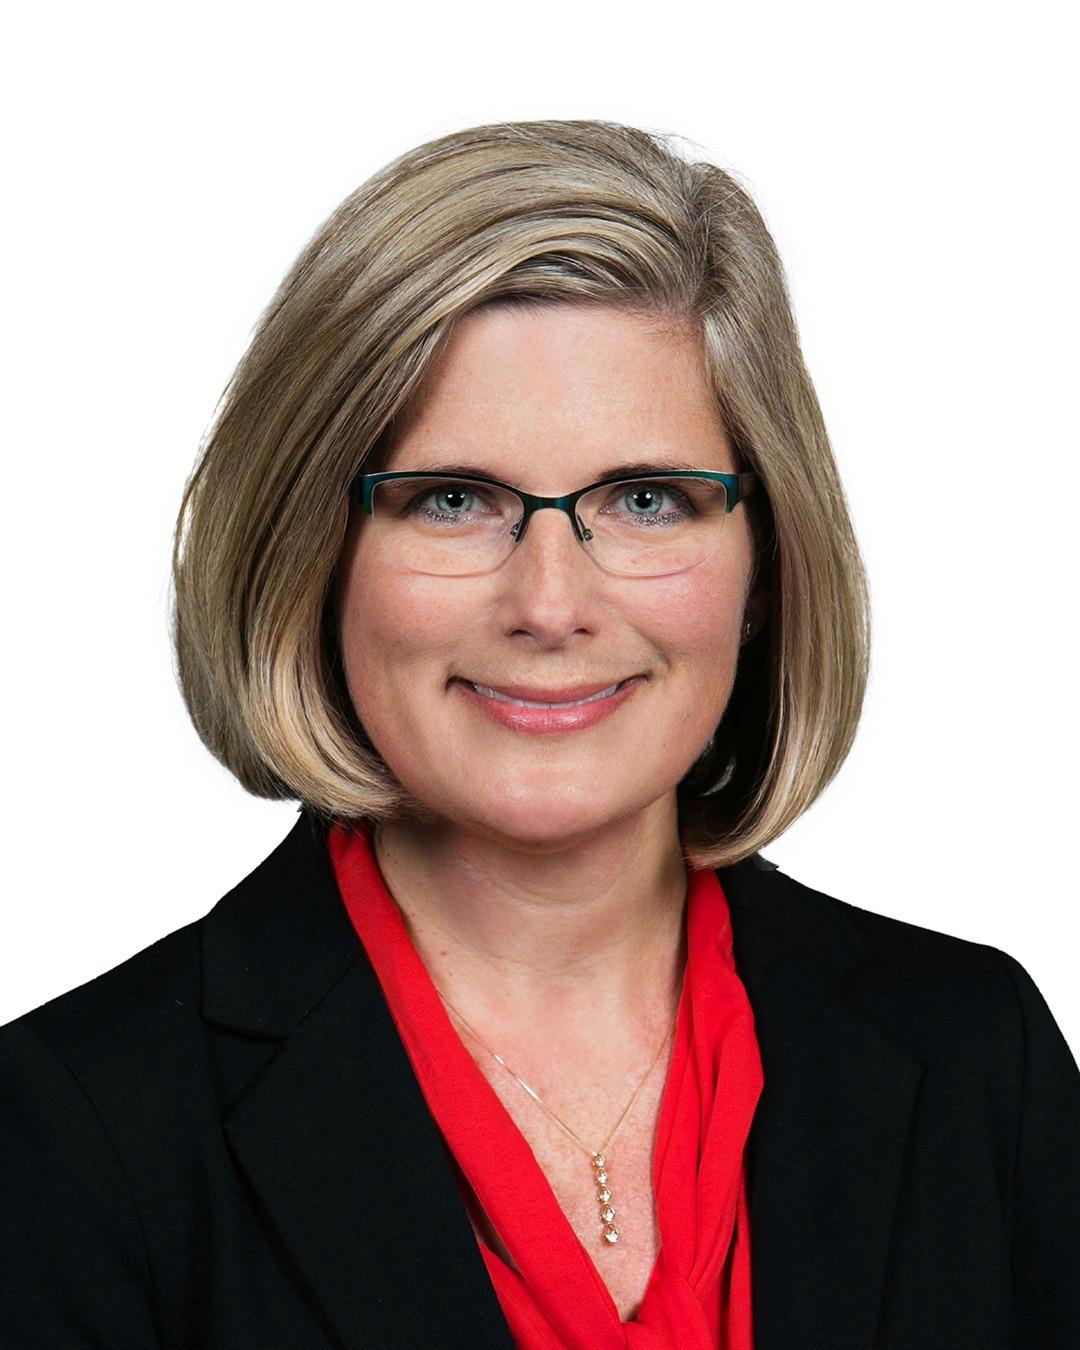 Ann C. Coker